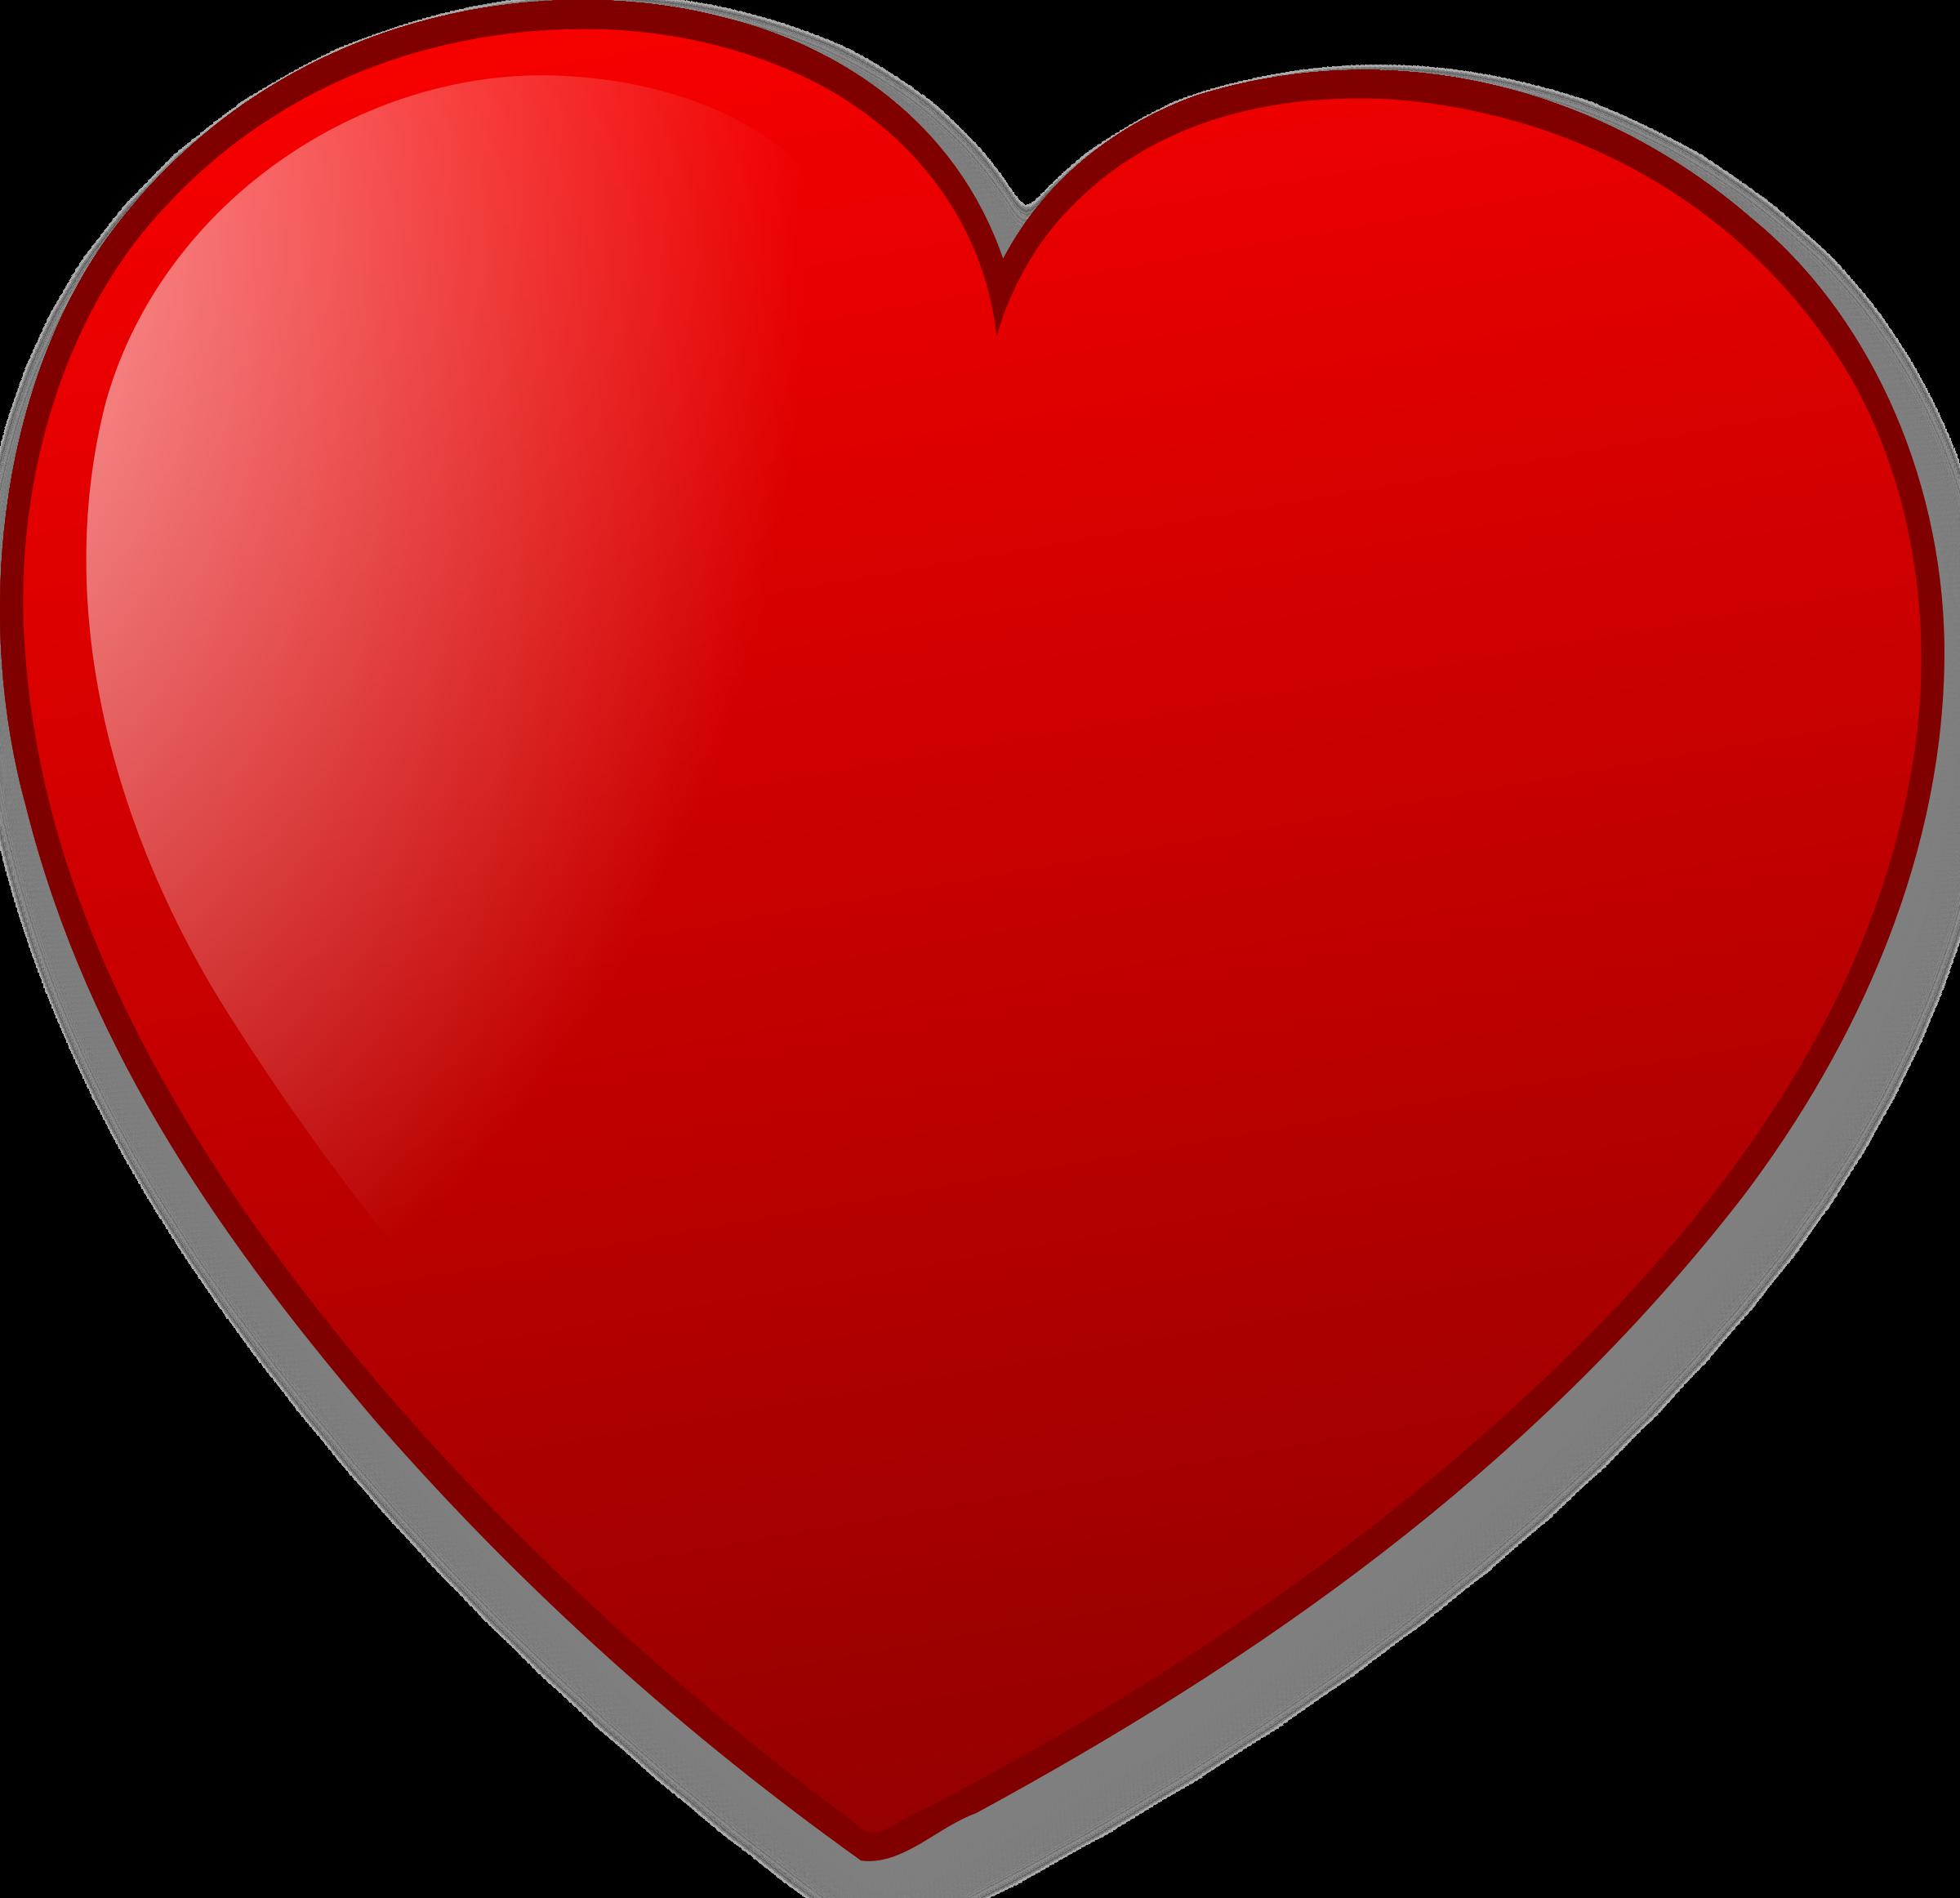 Clipart heart images svg transparent stock Clipart - heart svg transparent stock